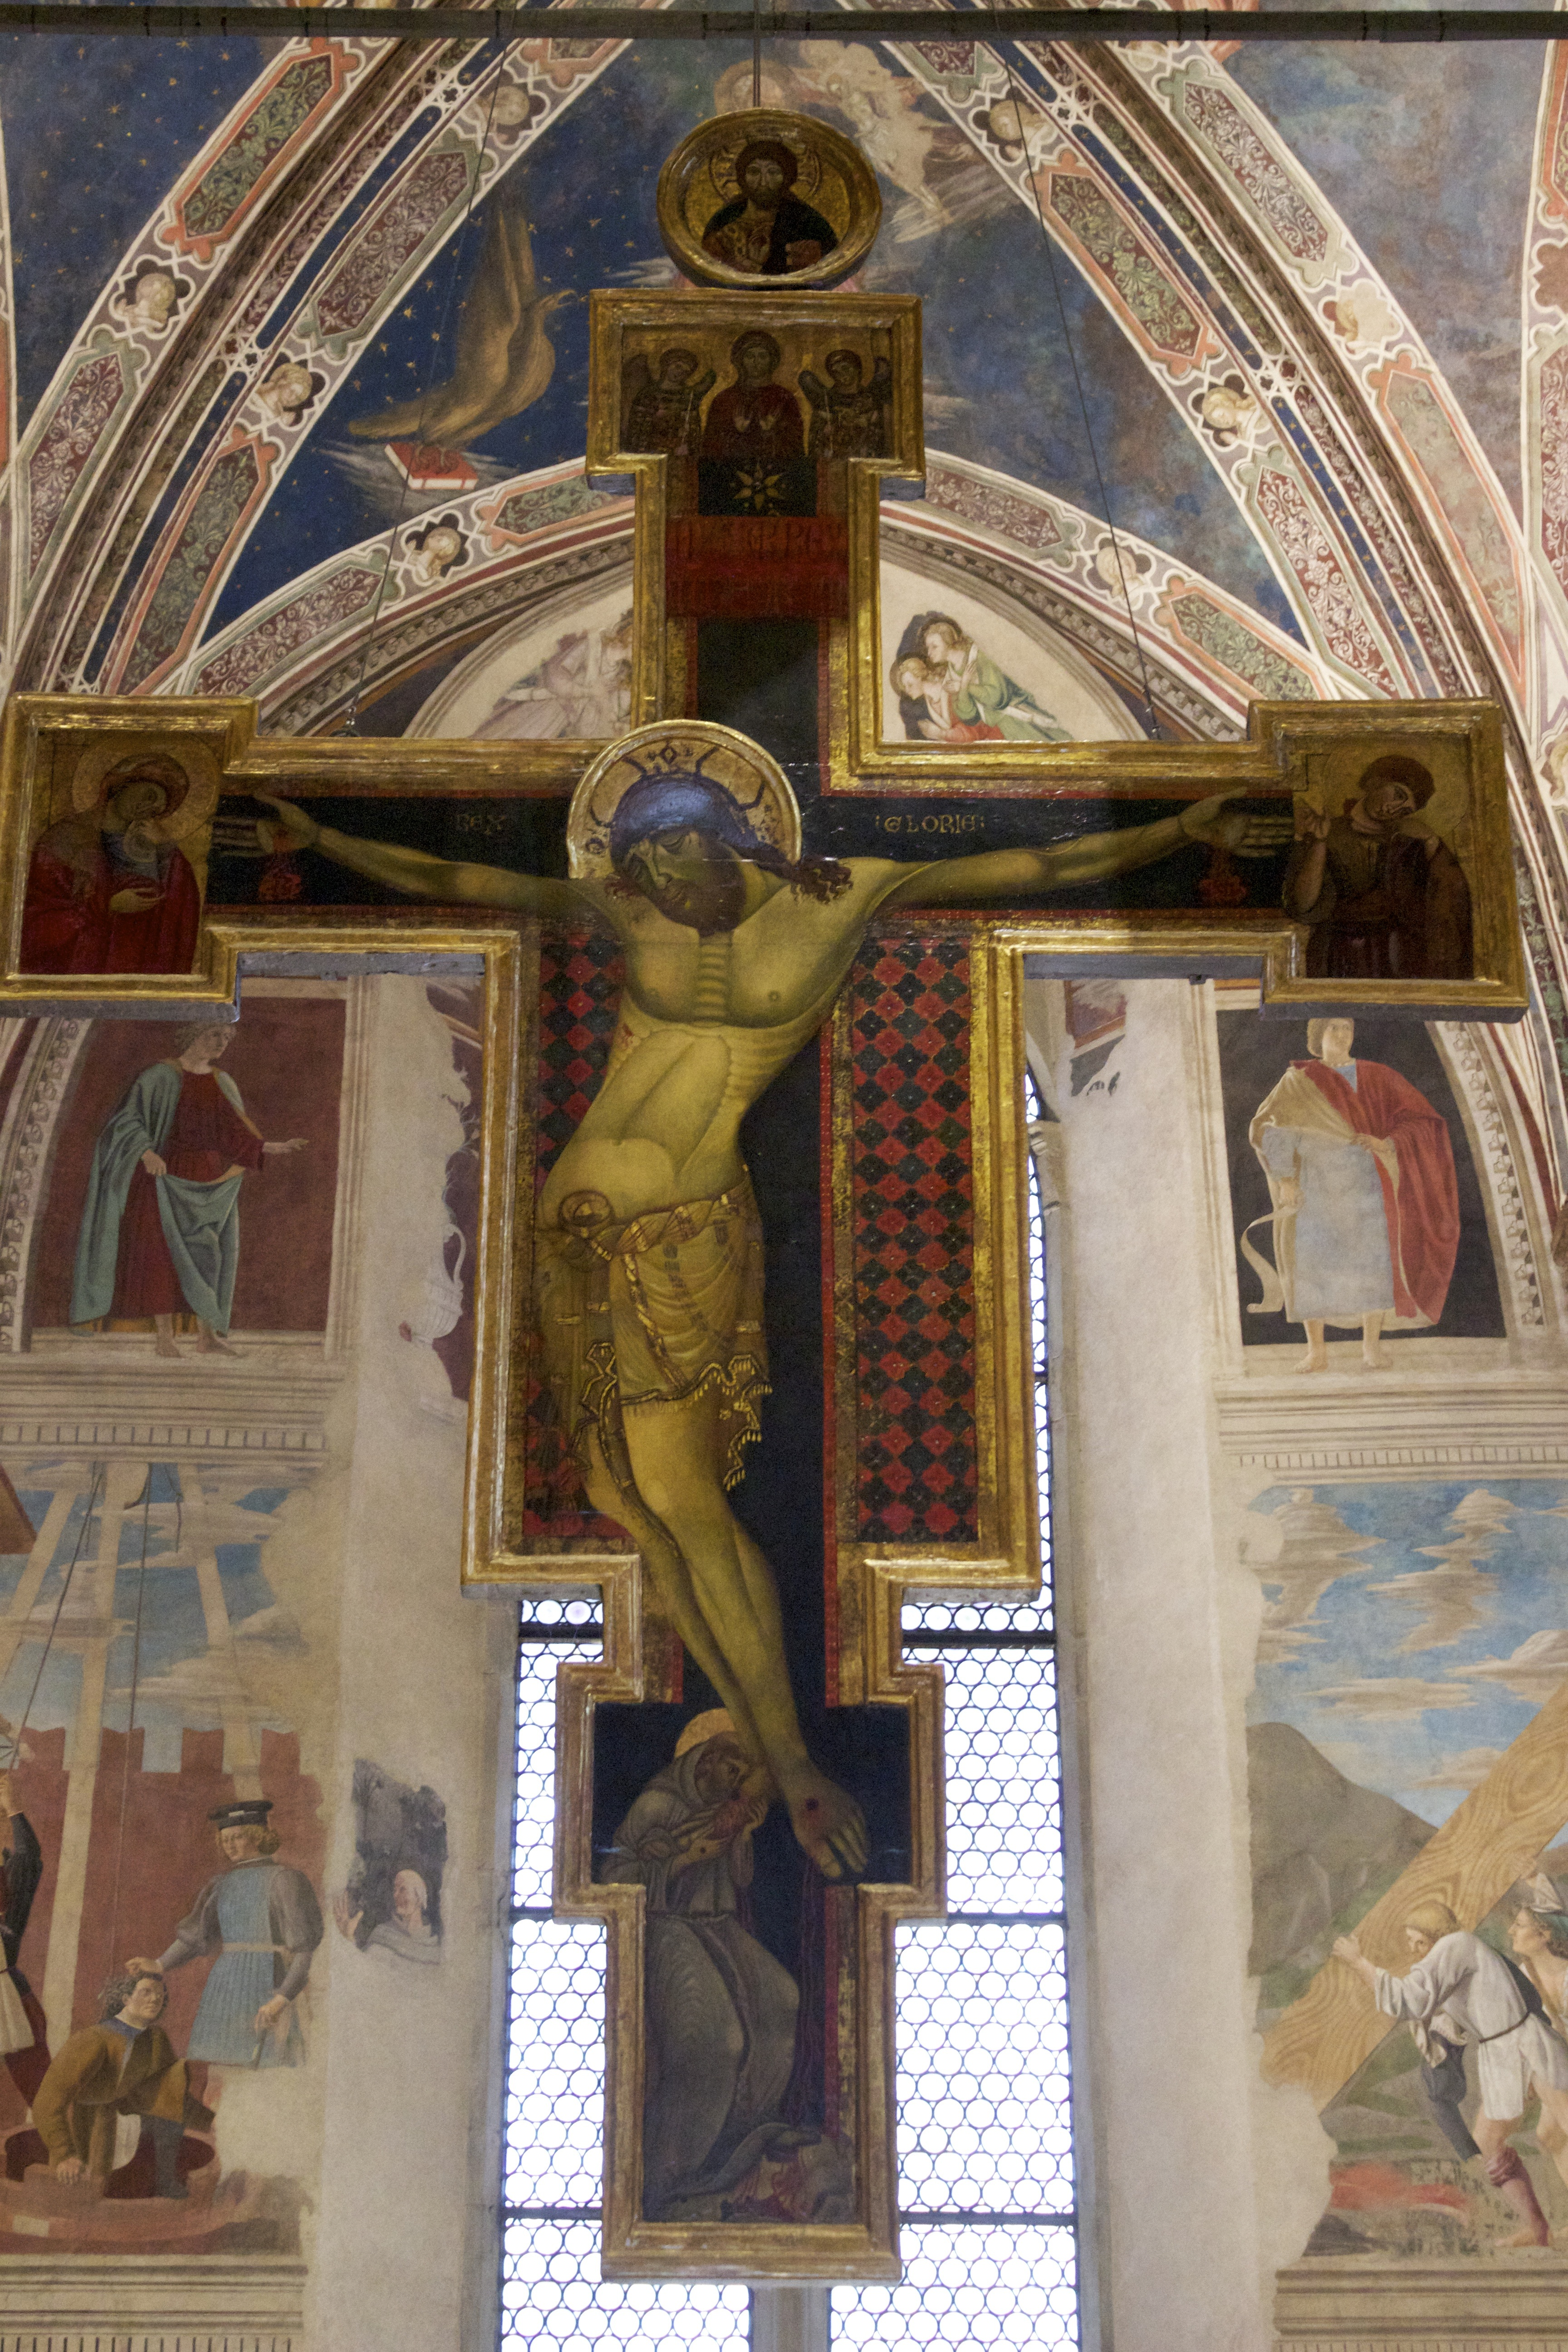 https://upload.wikimedia.org/wikipedia/commons/f/f6/Arezzo_Crucifijo_San_Francesco.jpg